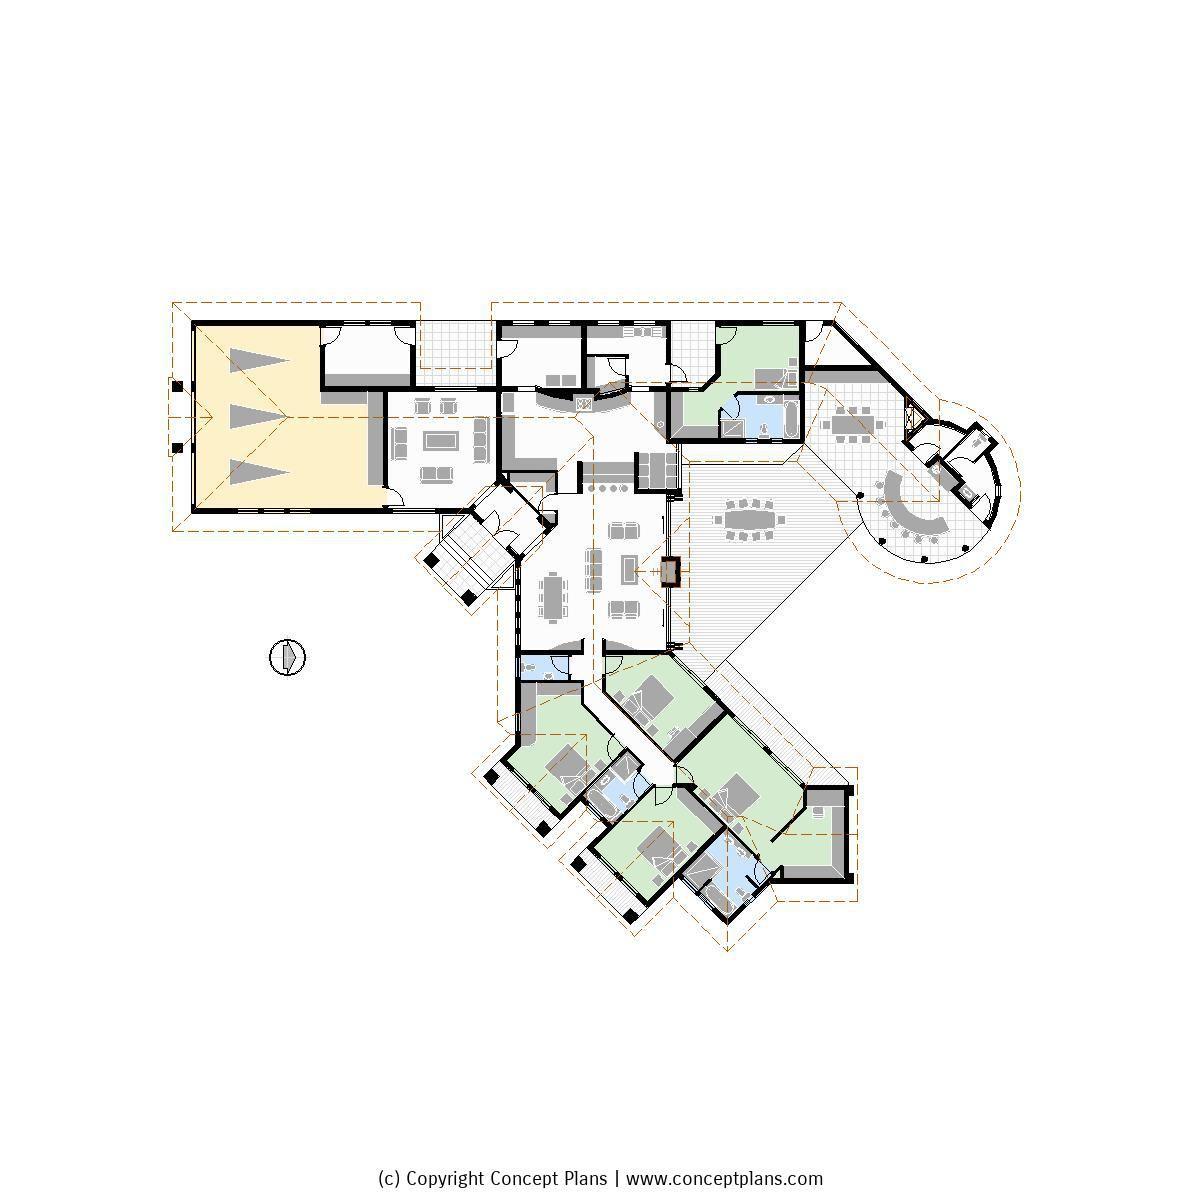 cp0497 1 5s4b3g house floor plan pdf cad - Versand Container Huser Plne Pdf